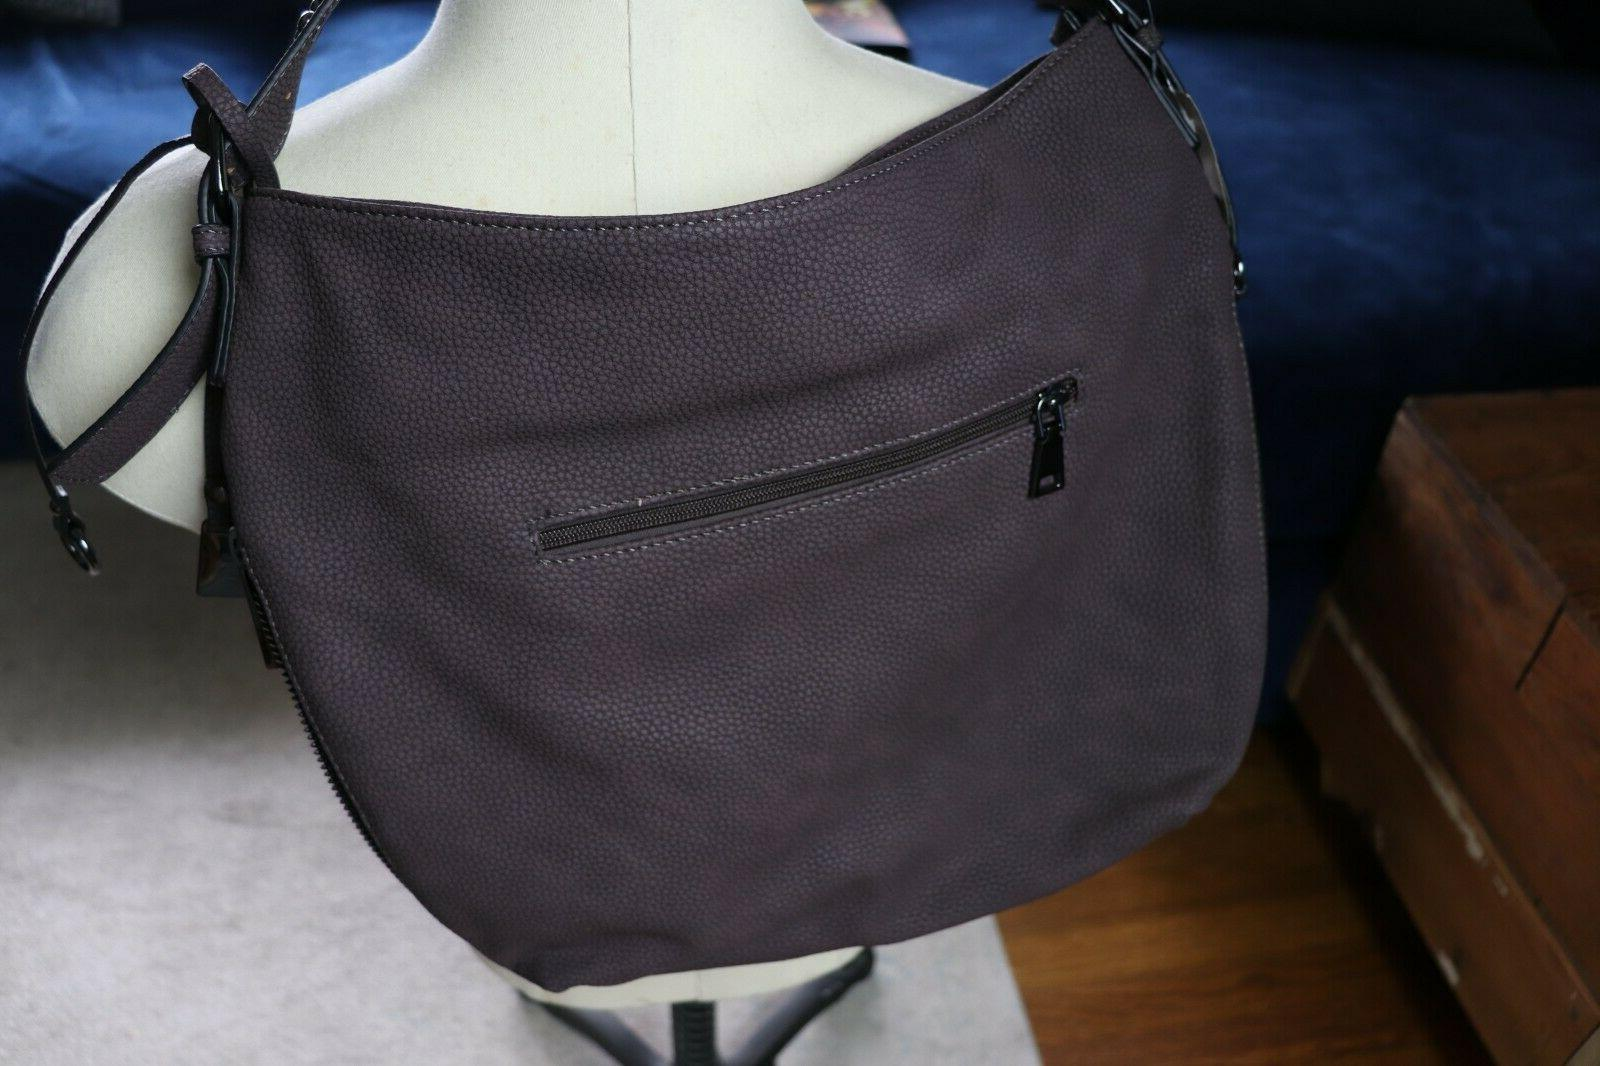 Wilsons Leather Bag Medium New tags $80 Retail